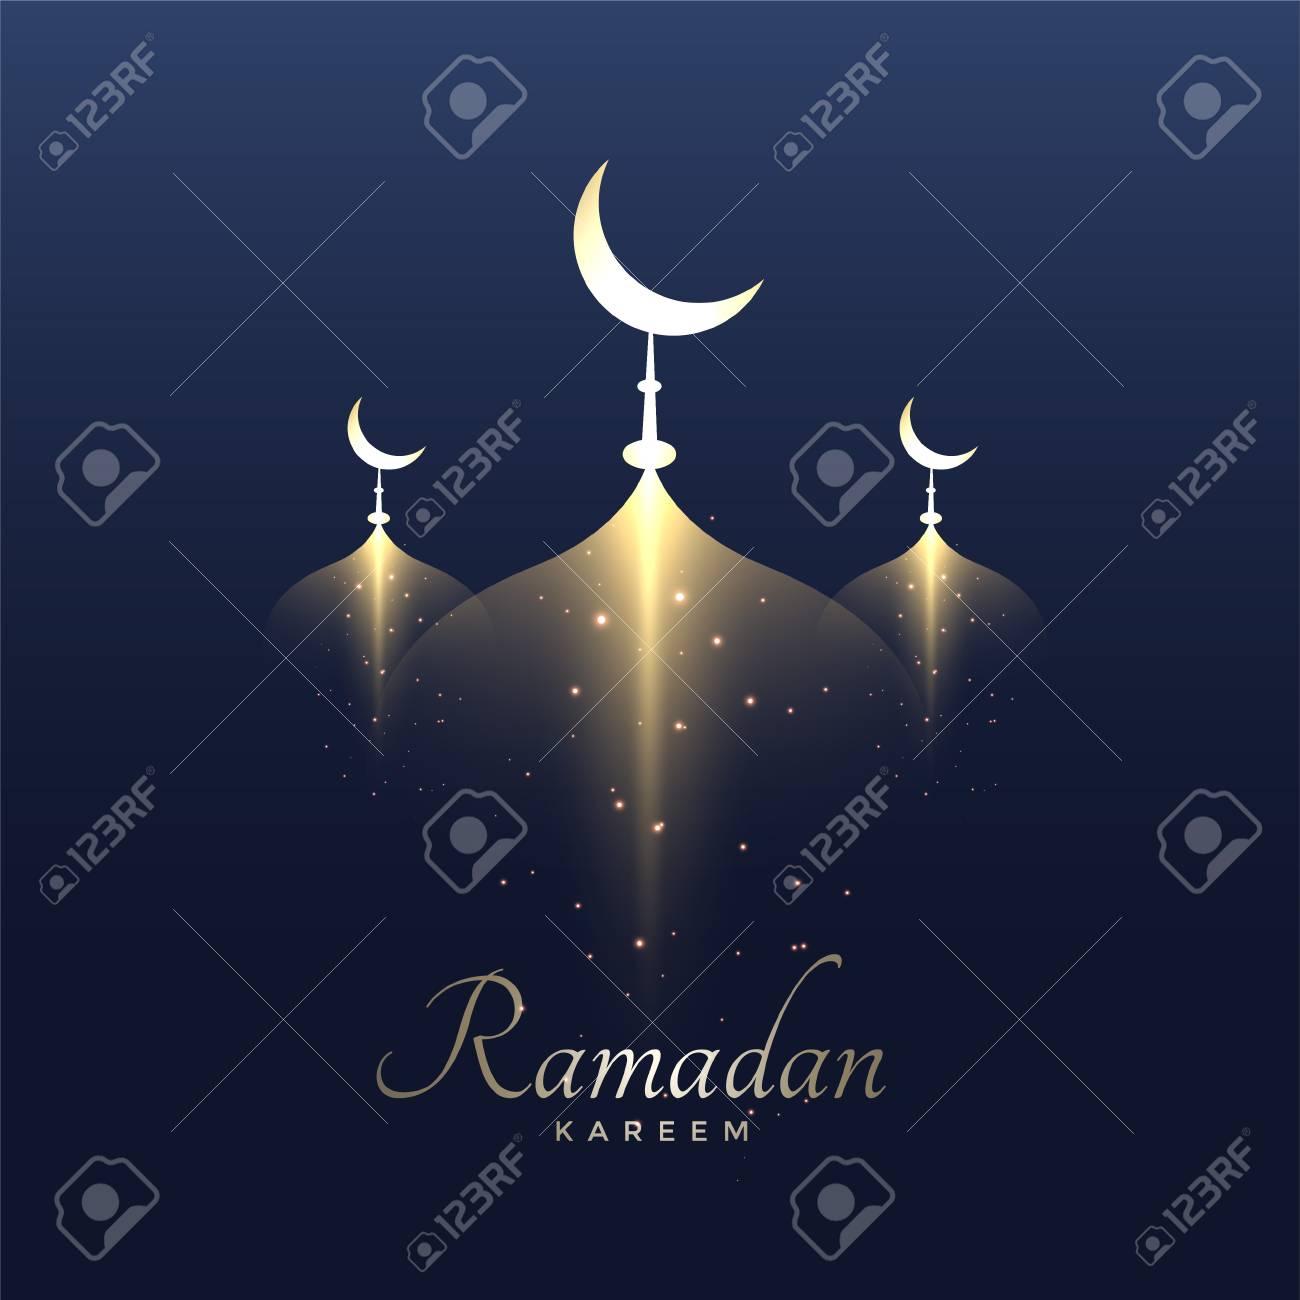 Awesome ramadan kareem design background - 99376209